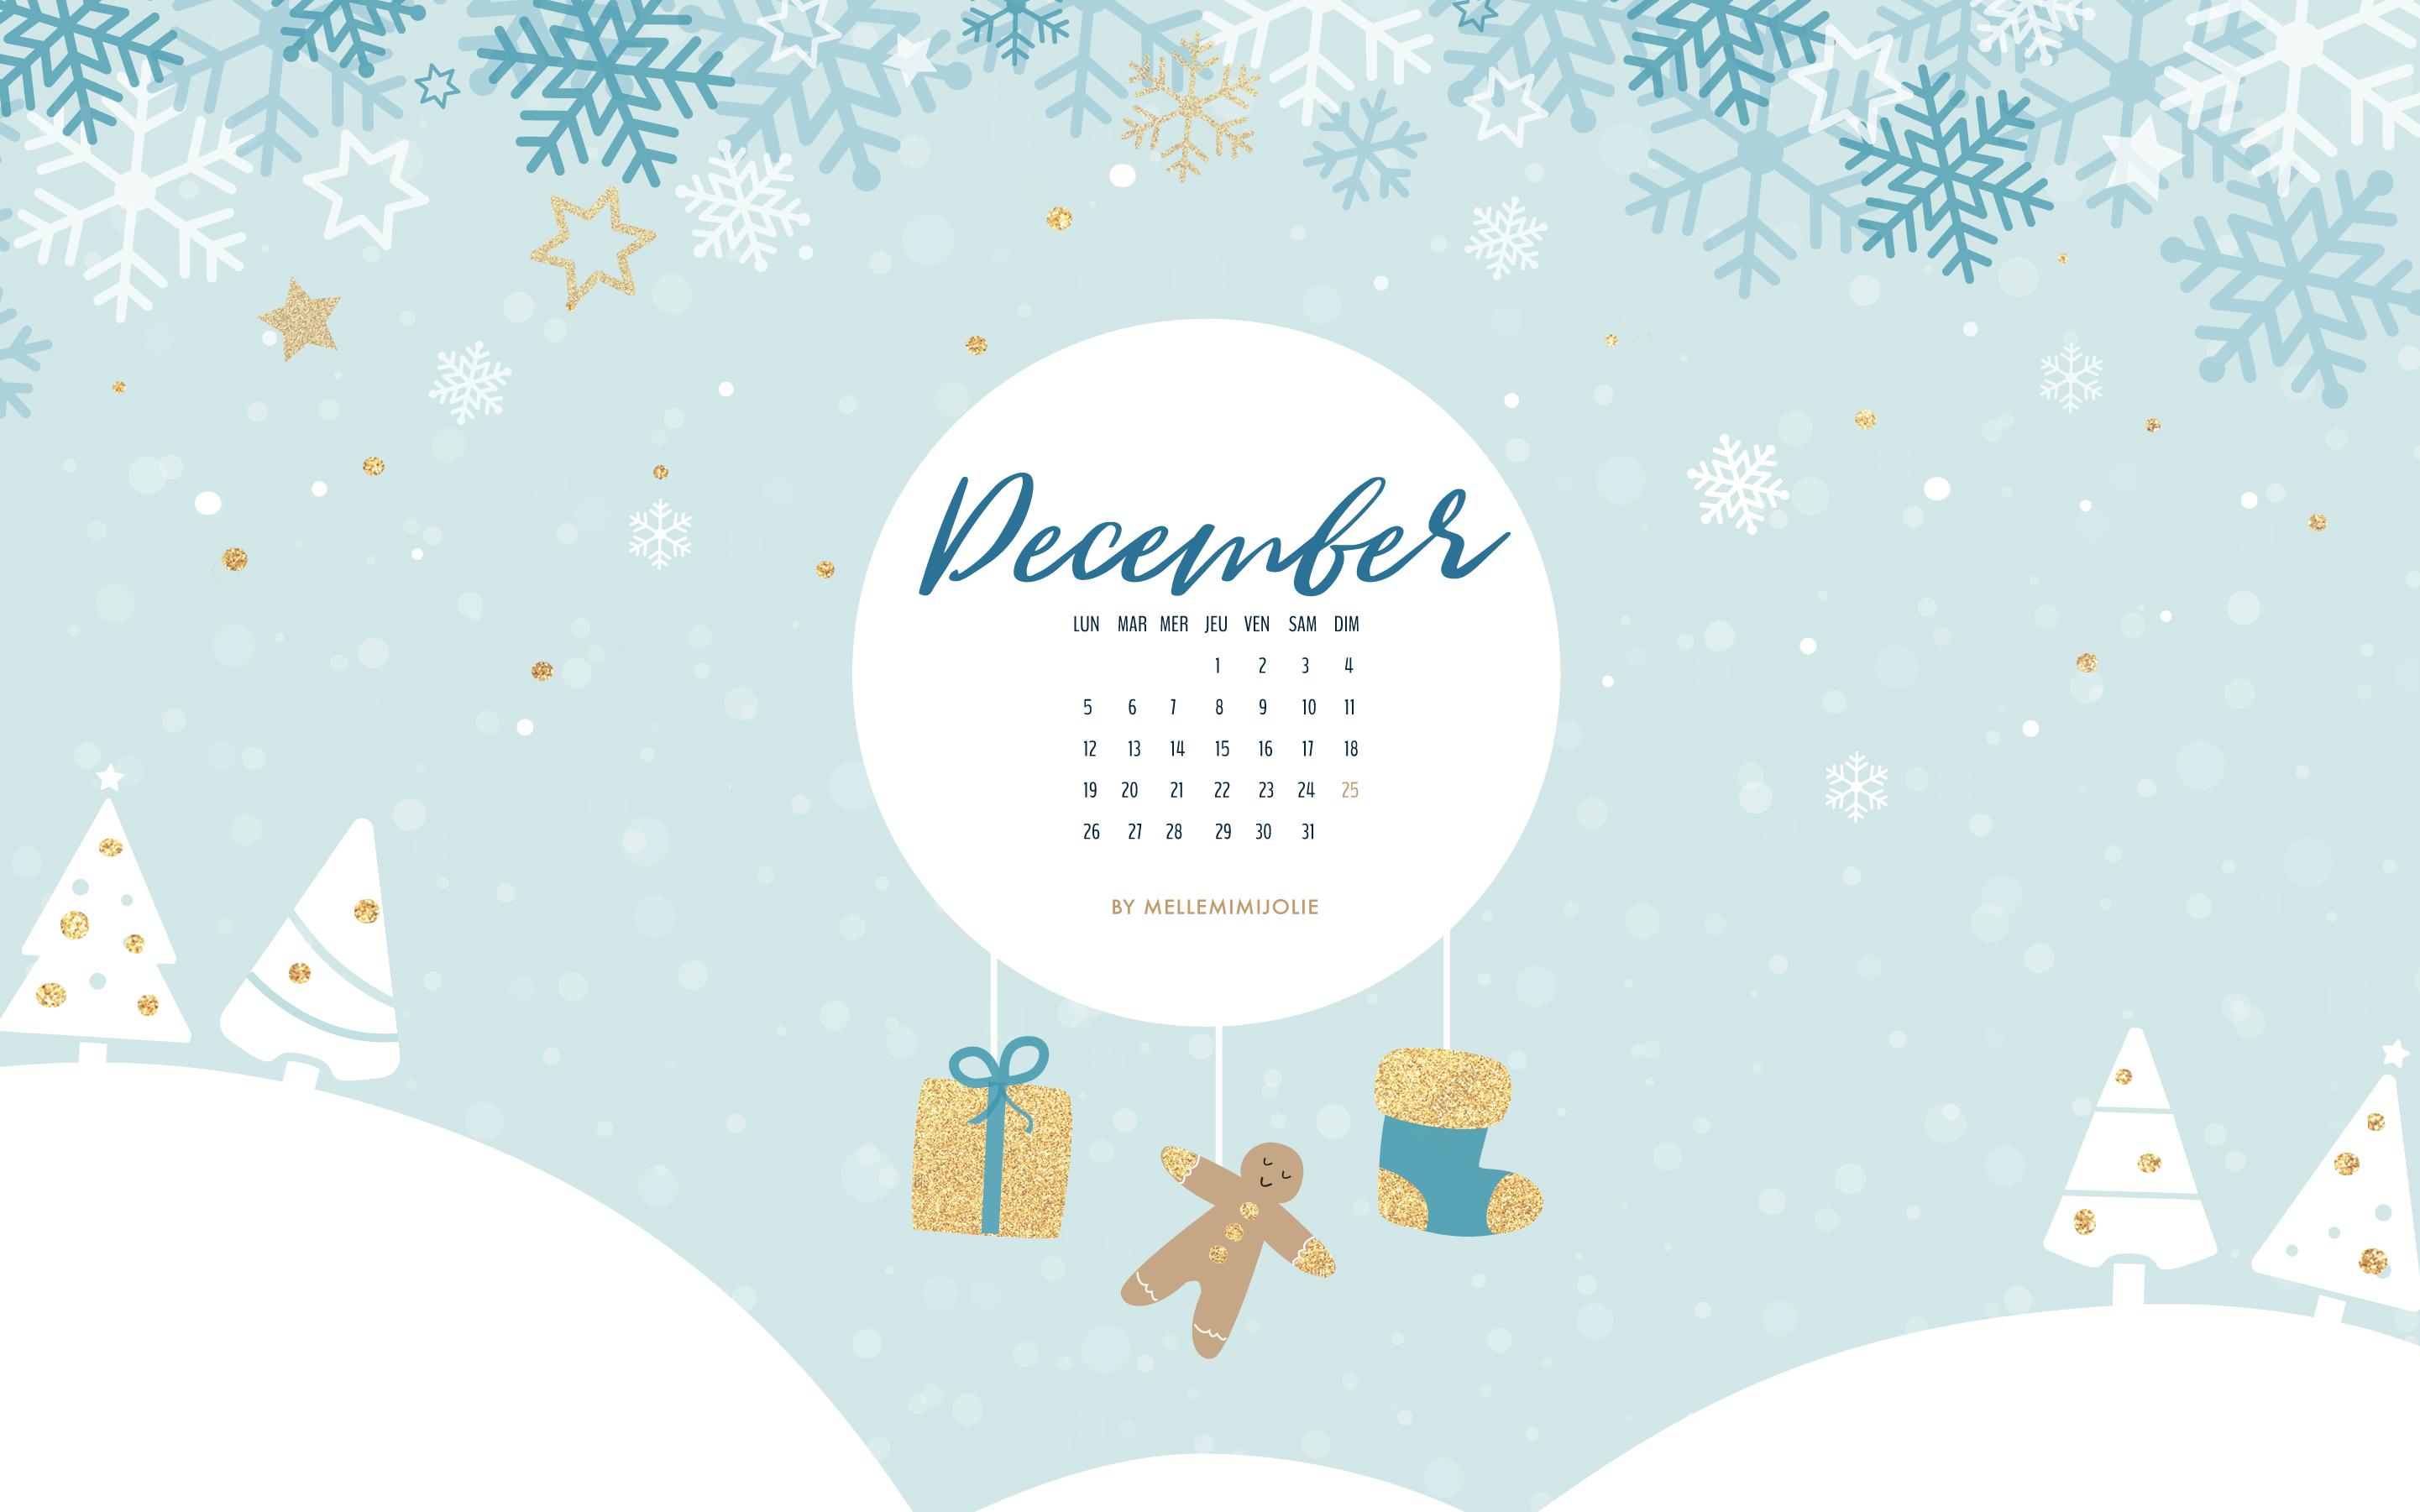 wallpaper-decembre-mellemimijolie